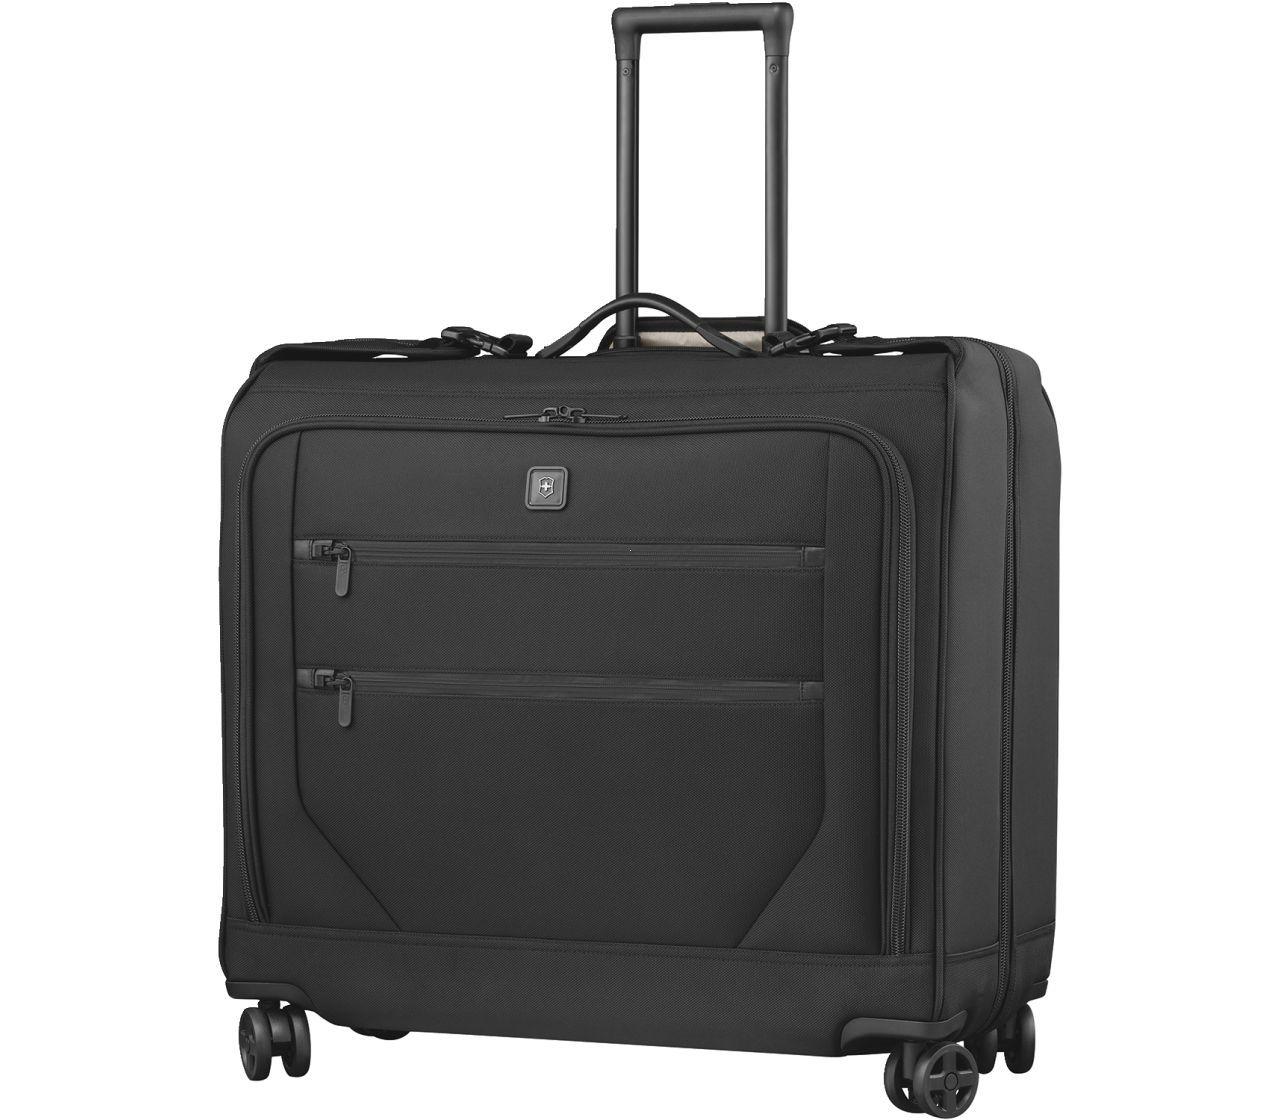 a1f3f44d82ffe Victorinox Lexicon 2.0 Torba na garnitur ubranie na kółkach Dual-Caster  Germent Bag czarna ...